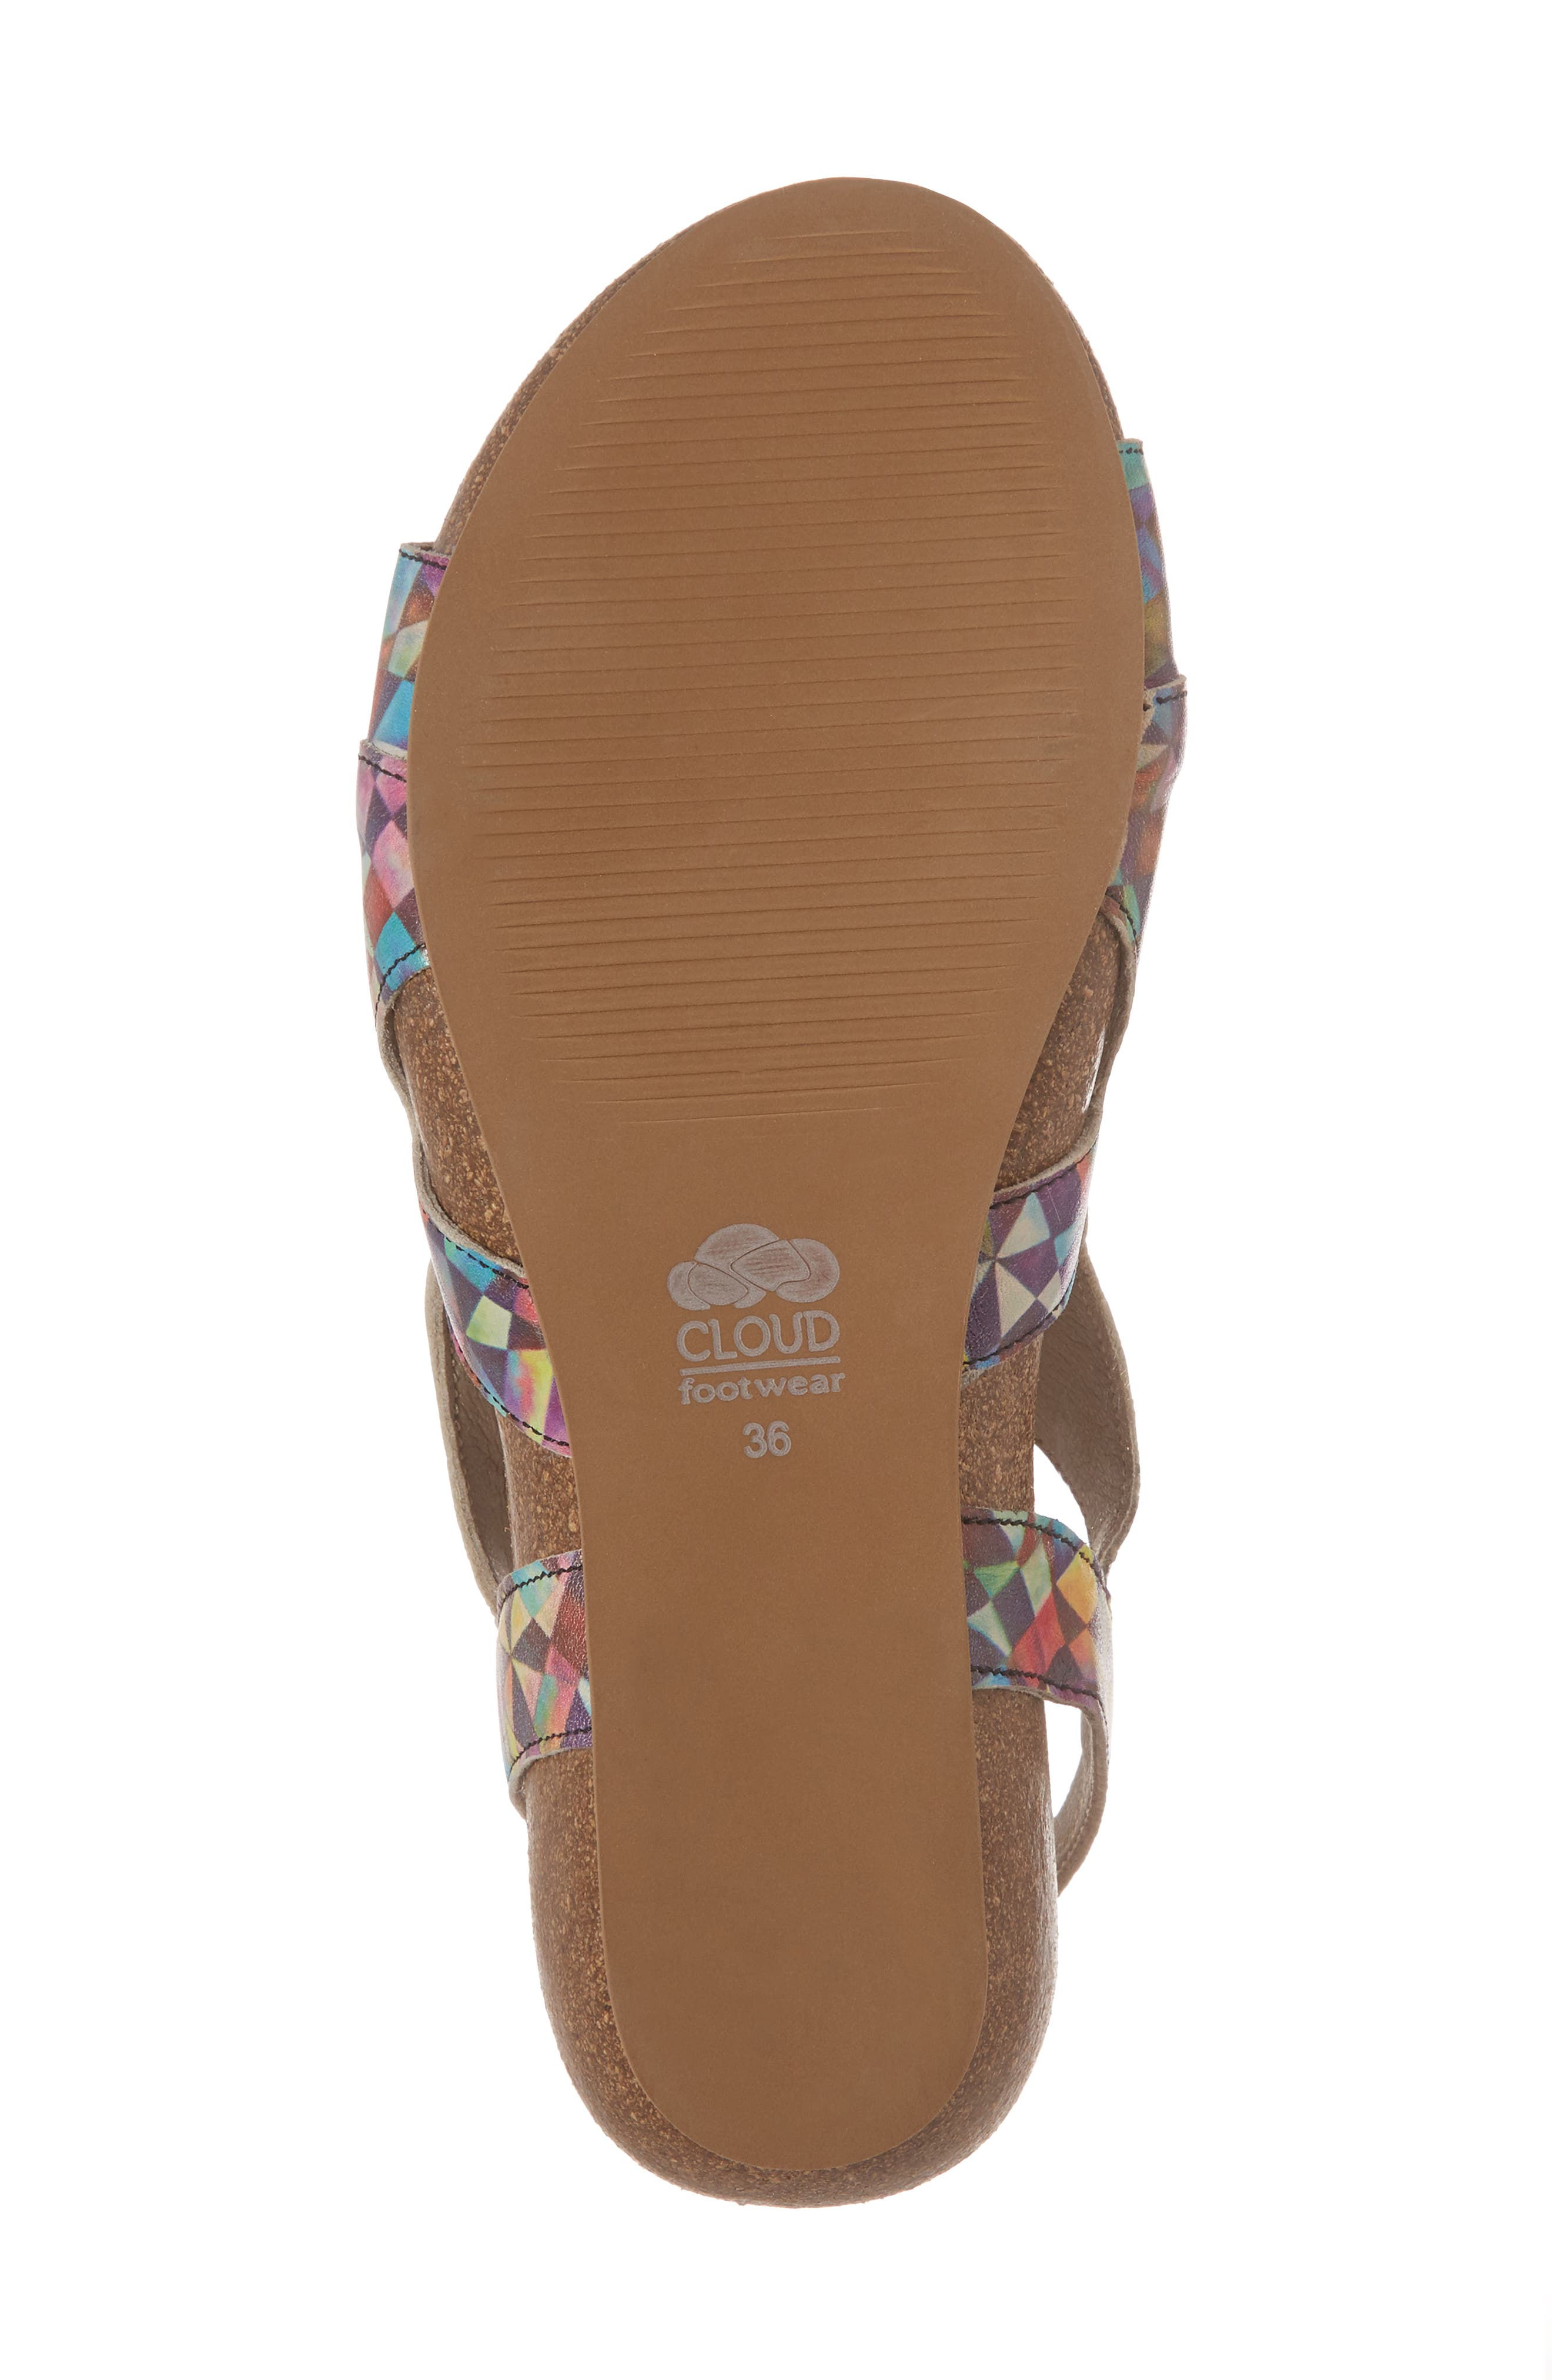 Duffy Wedge Sandal,                             Alternate thumbnail 6, color,                             Mystere Leather